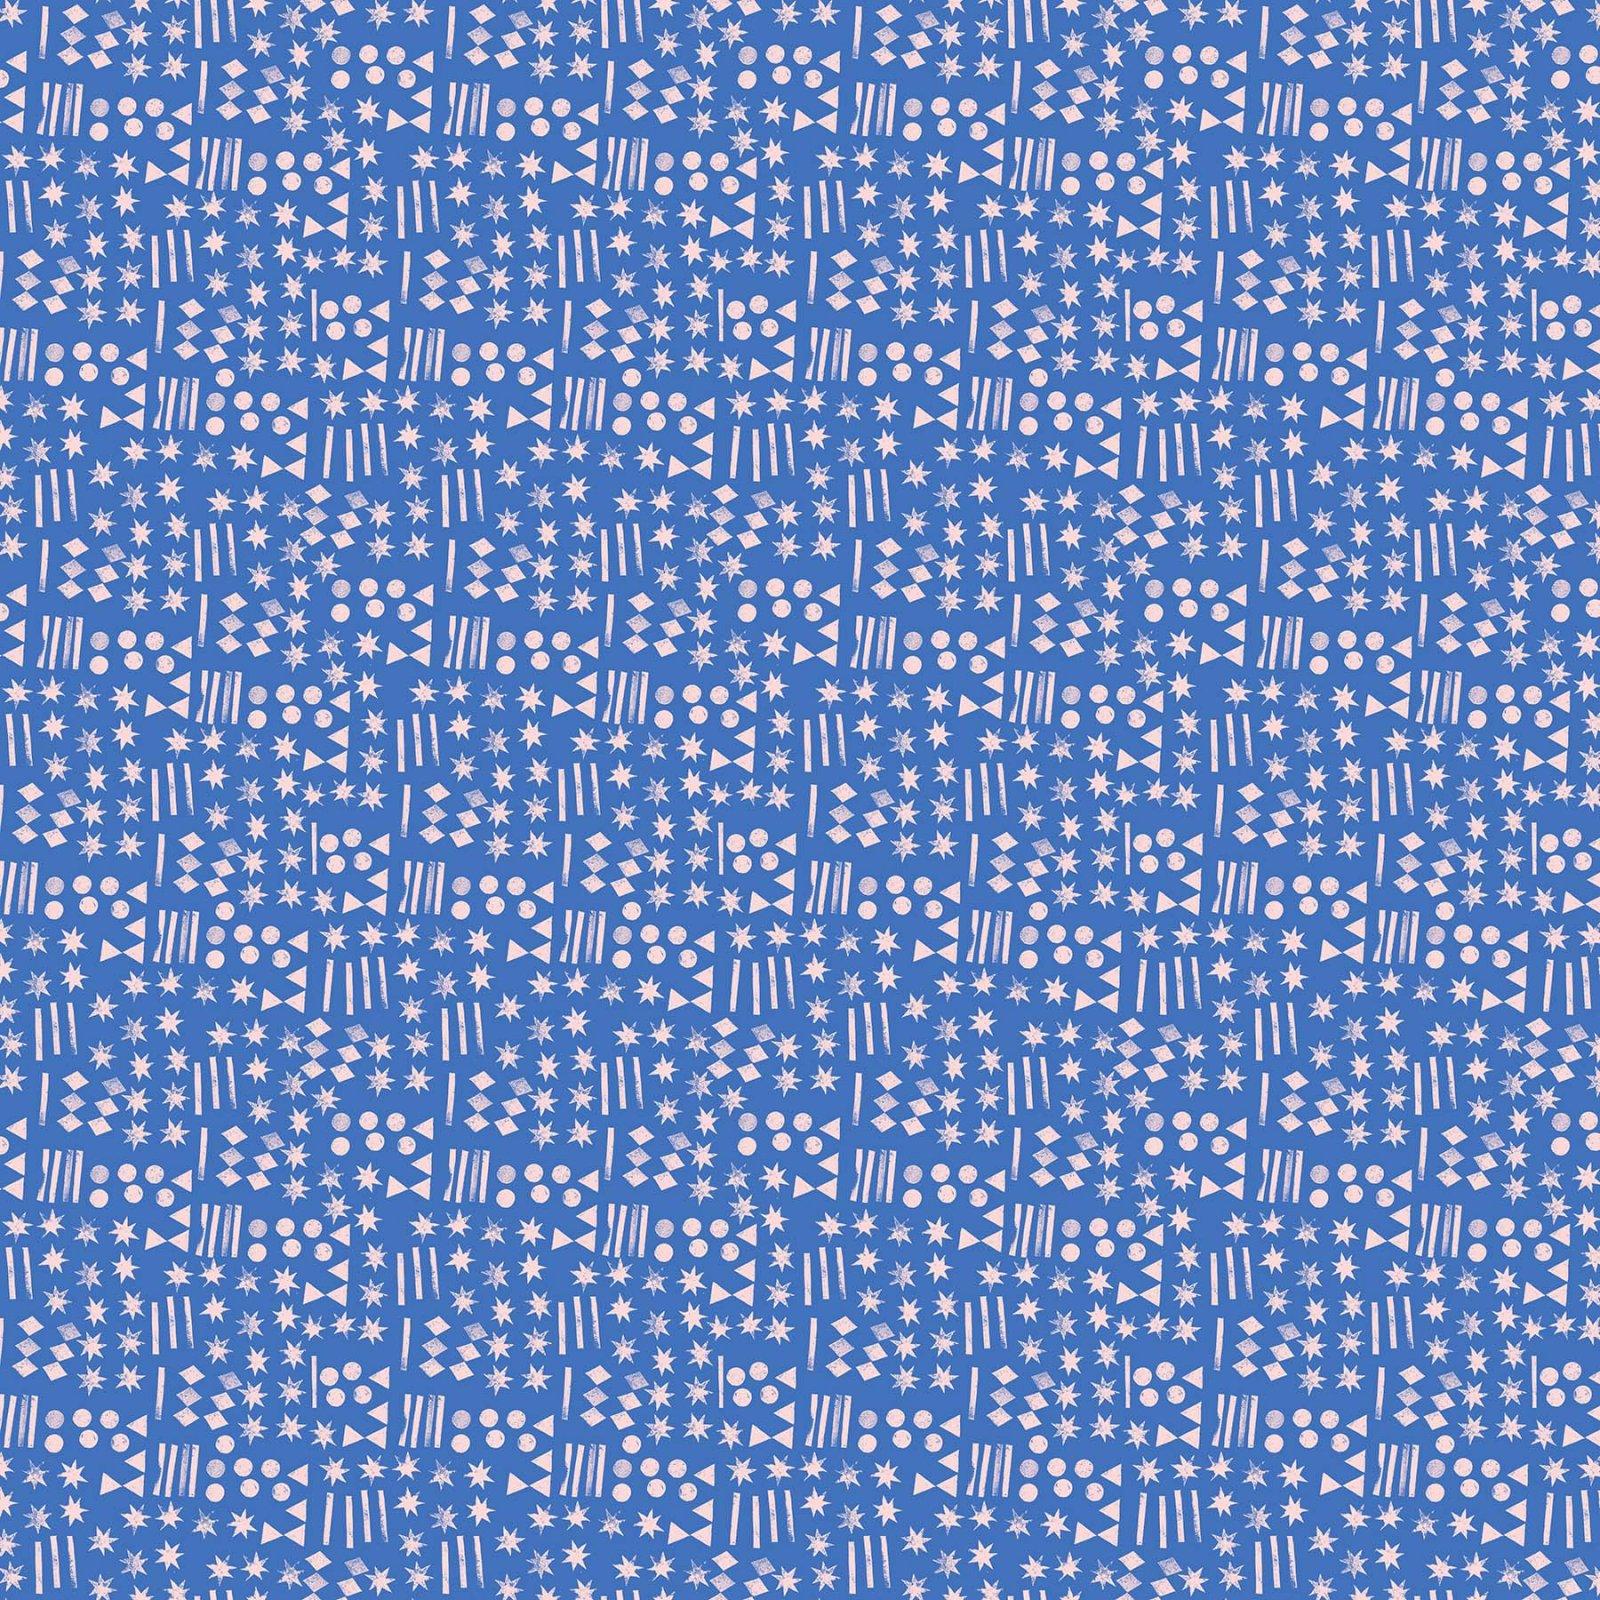 Moonlit Voyage - 90055-42 - Blue